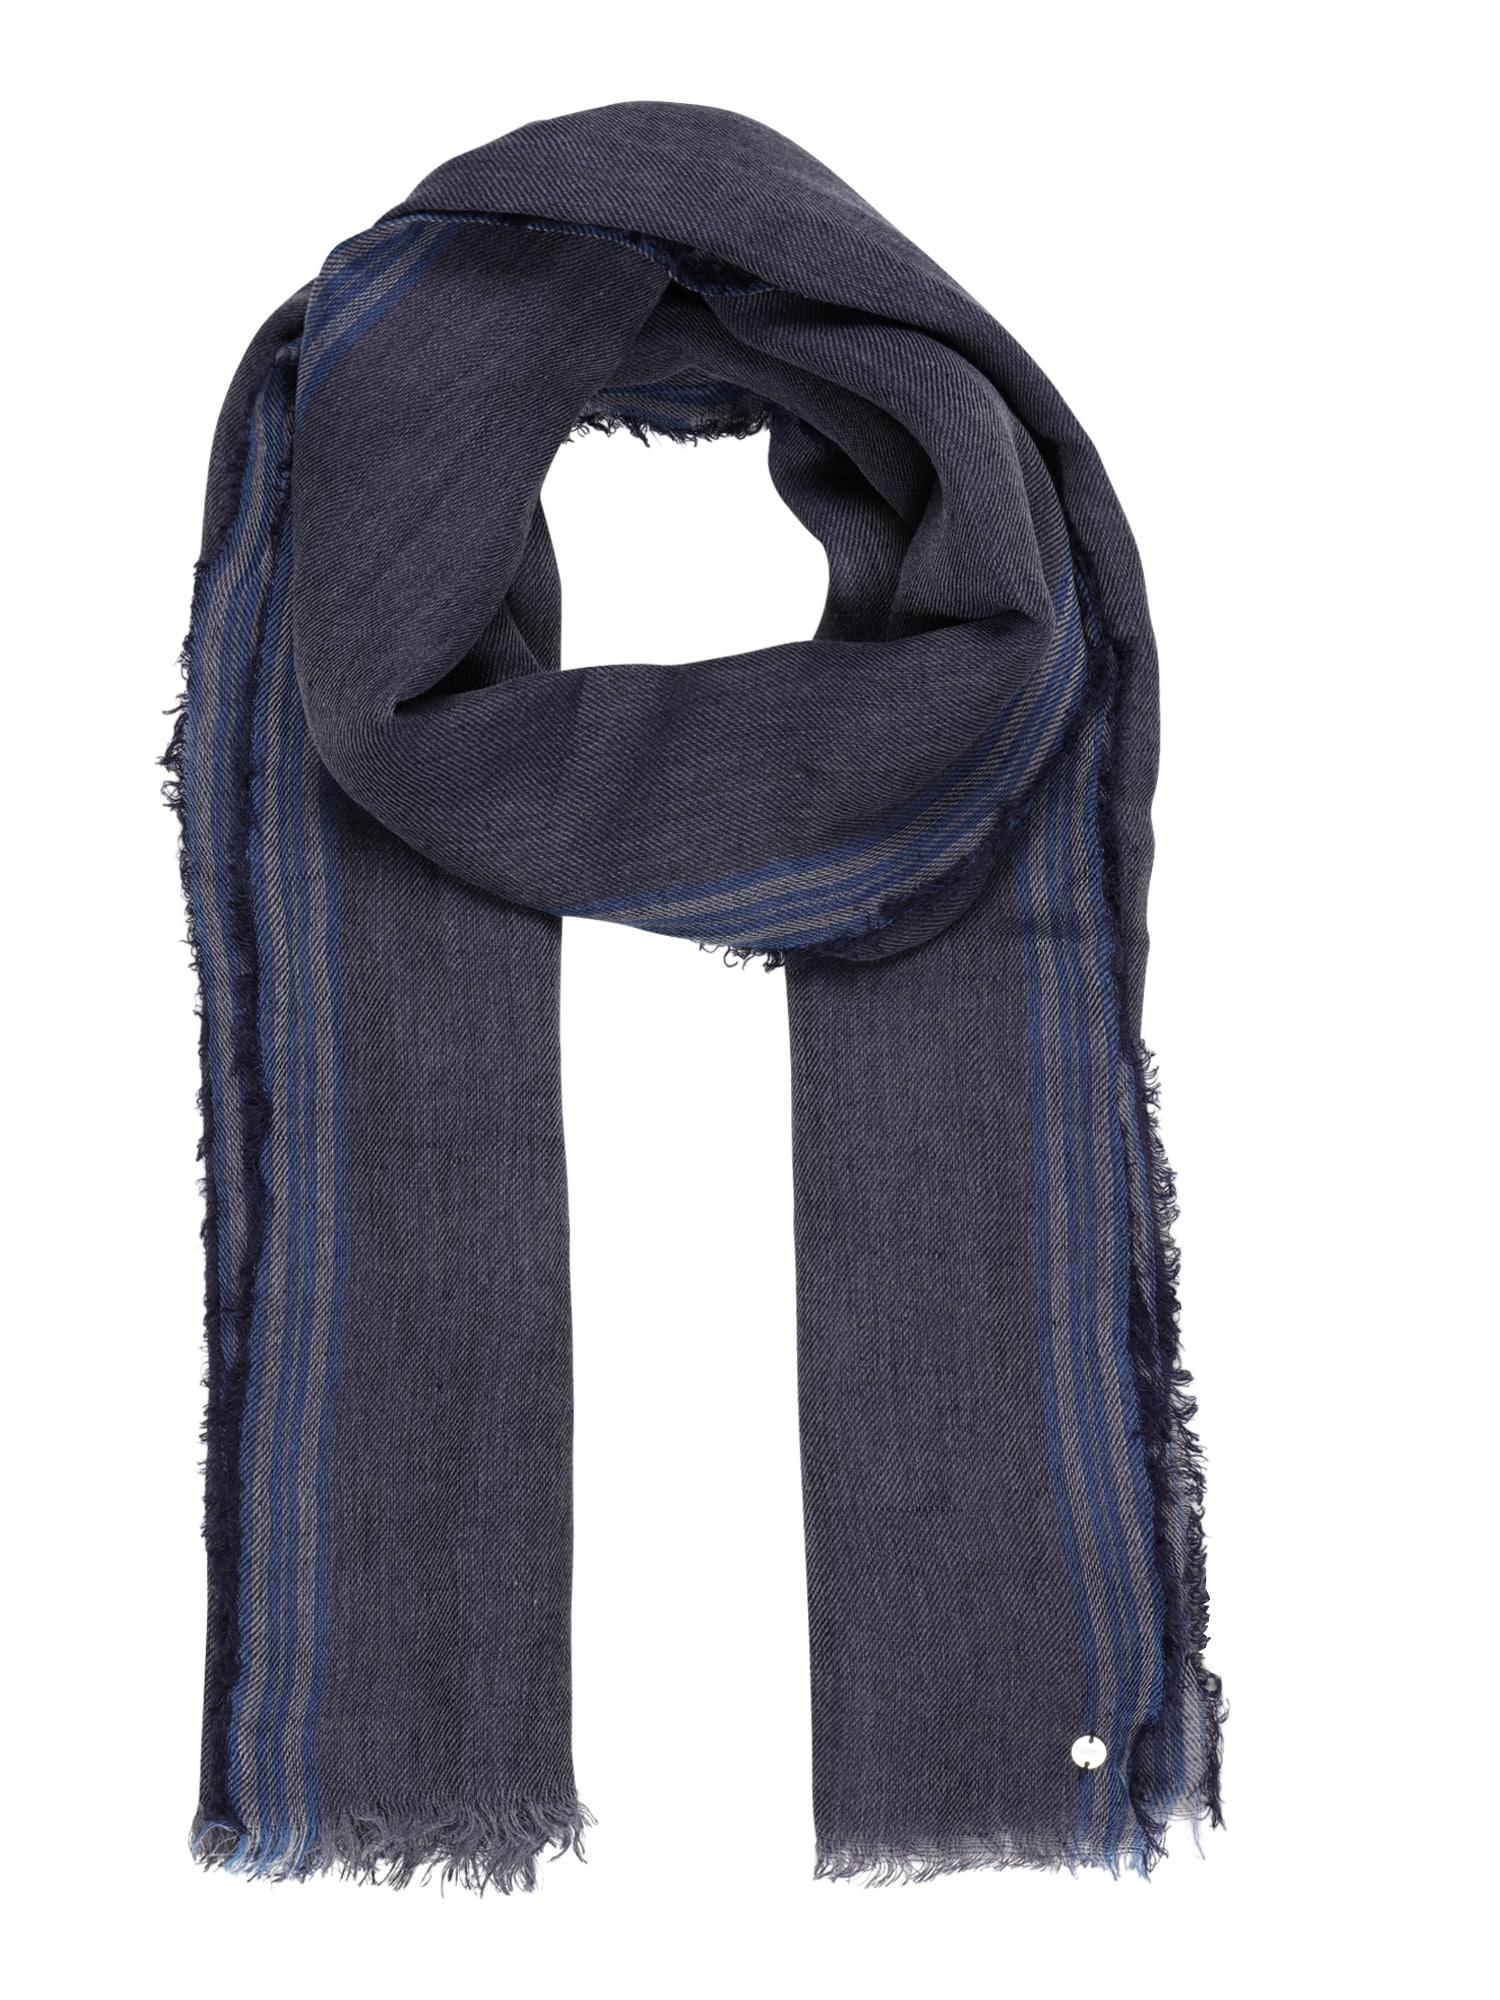 ESPRIT Skara tamsiai mėlyna / melsvai pilka